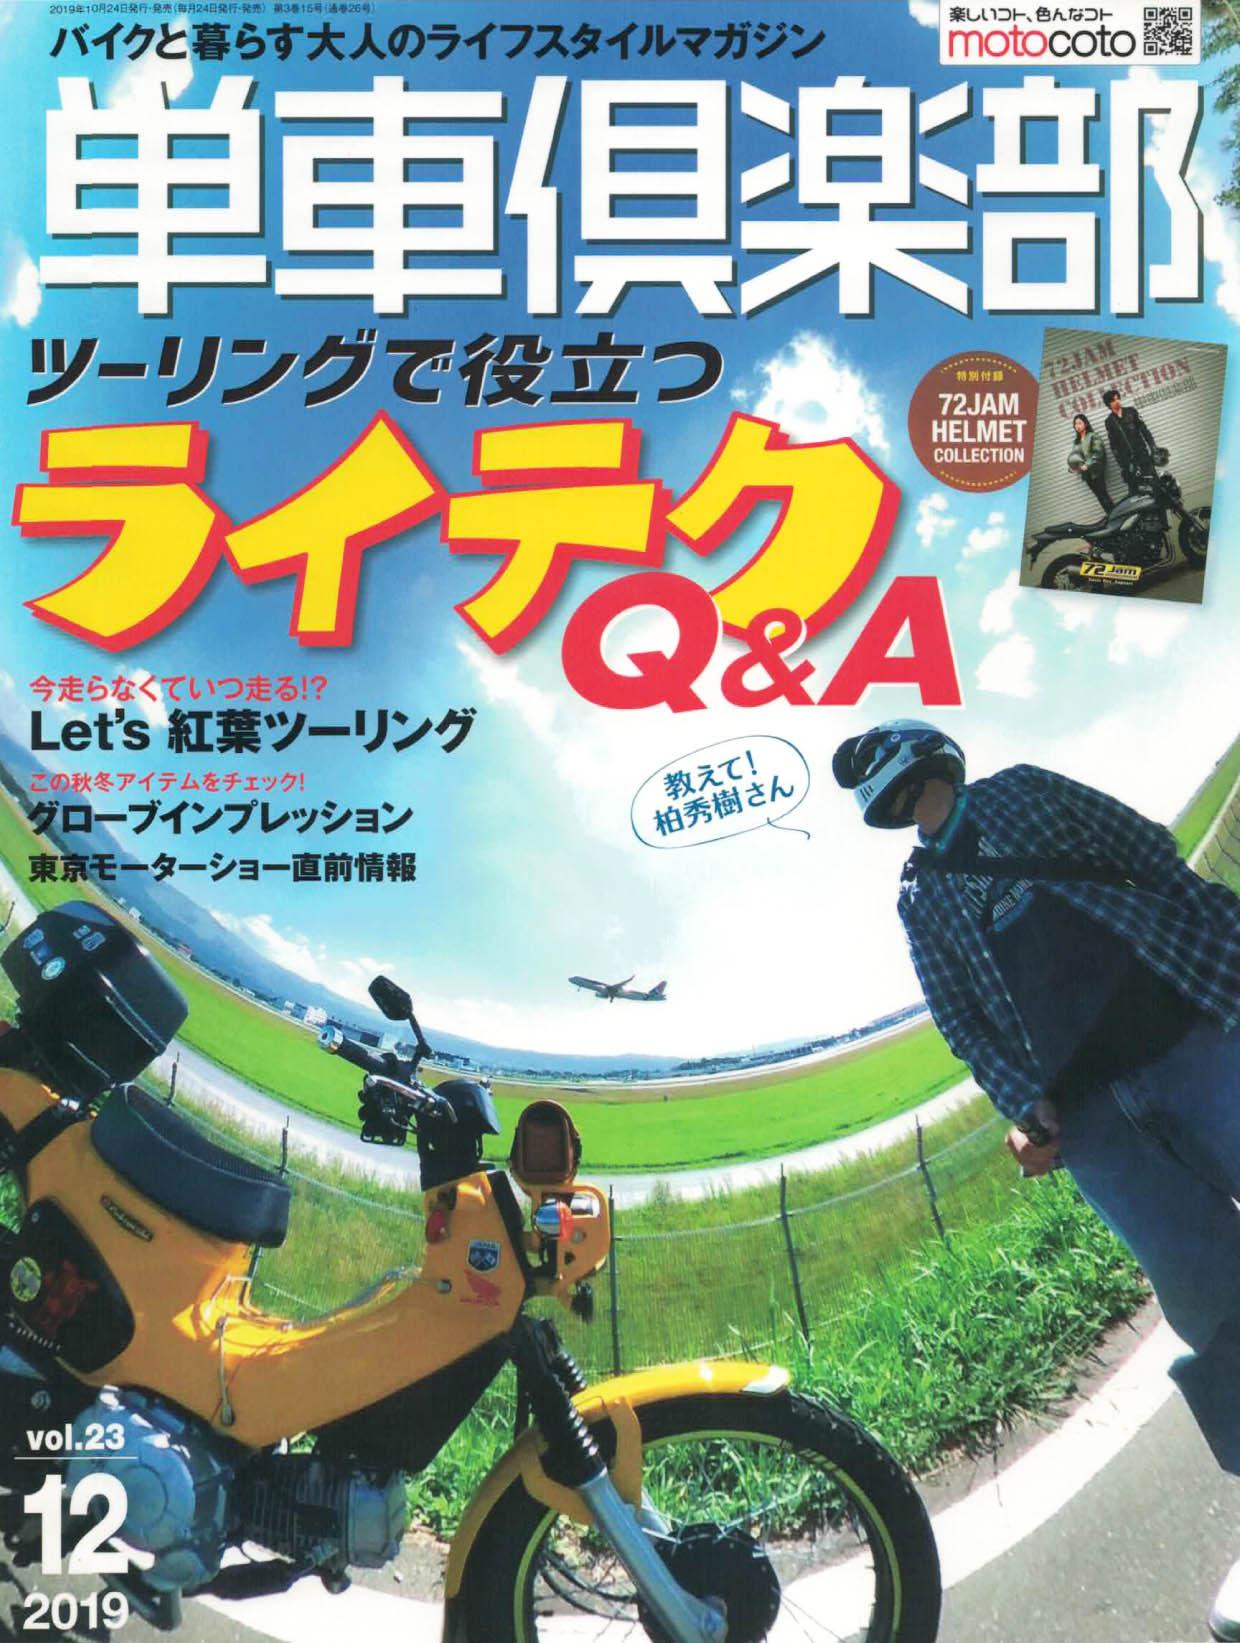 【単車倶楽部12月号掲載】FANTIC CABALLERO SCRAMBLER250